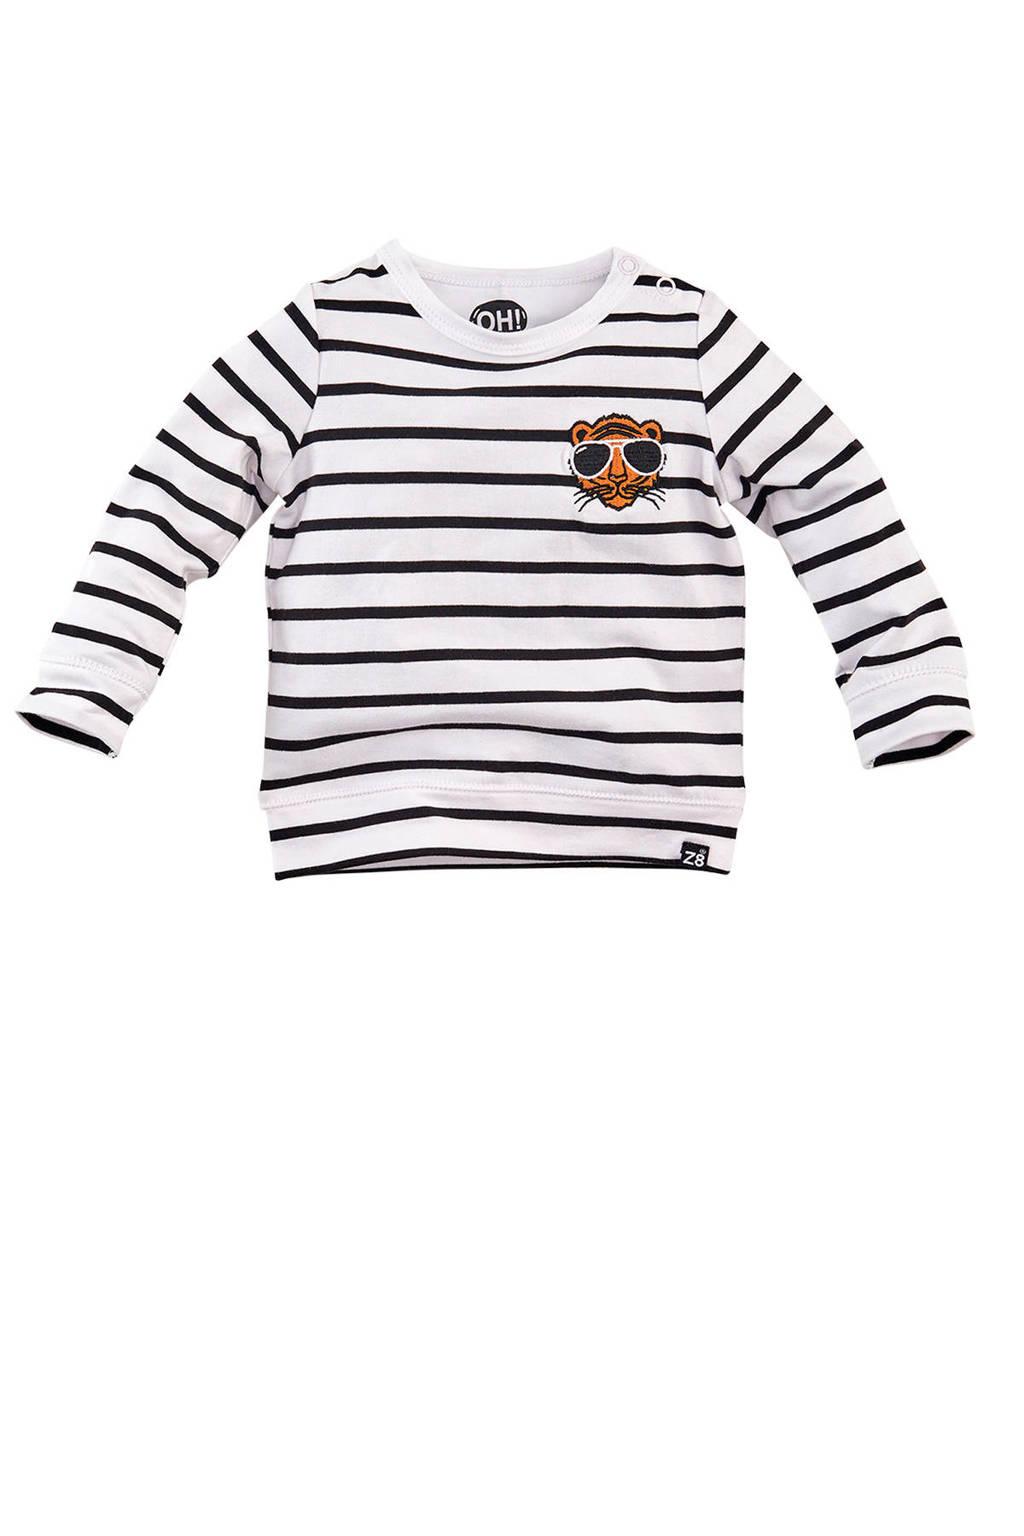 Z8 longsleeve Stockholm streep wit/zwart/oranje, Wit/zwart/oranje